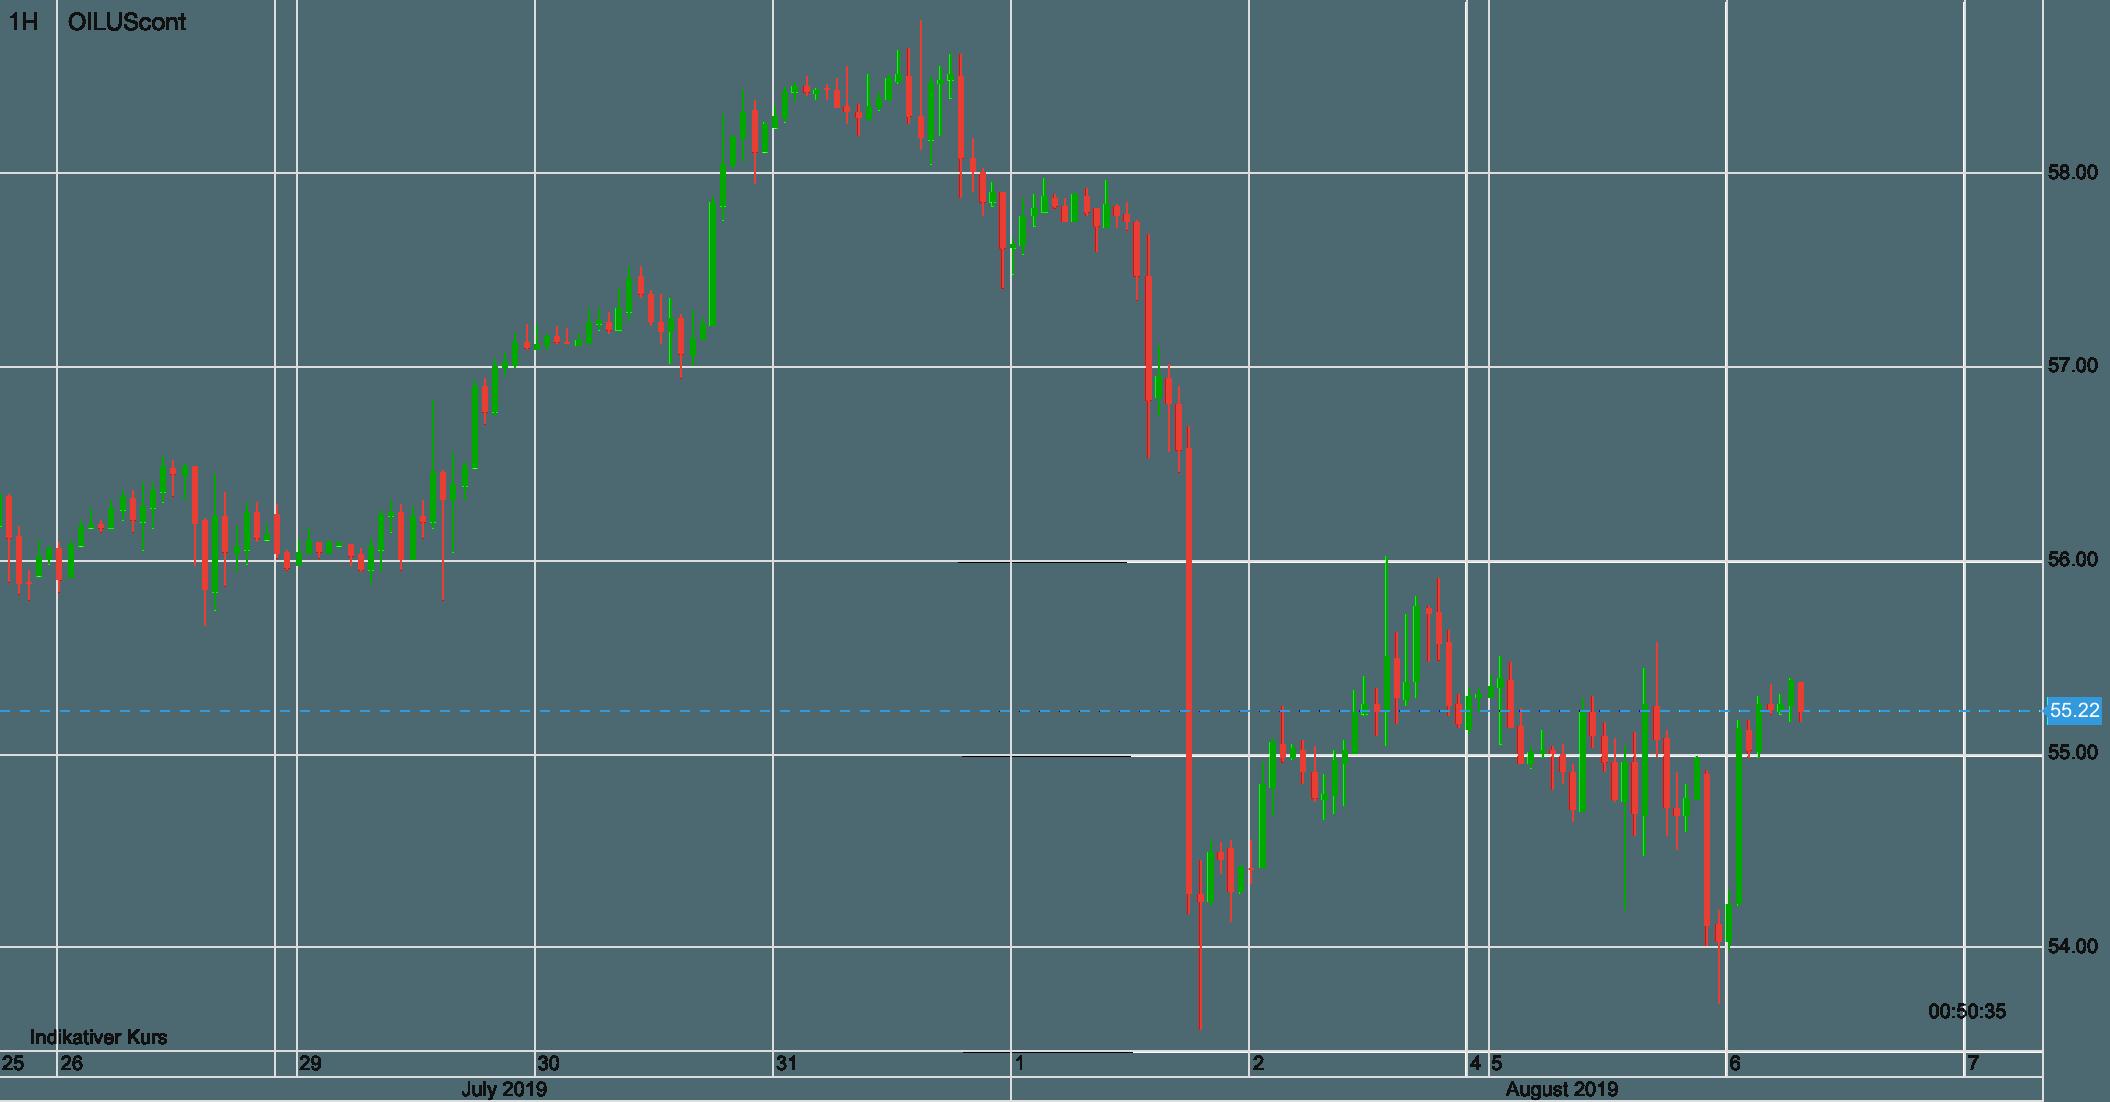 Ölpreis WTI seit 26. Juli